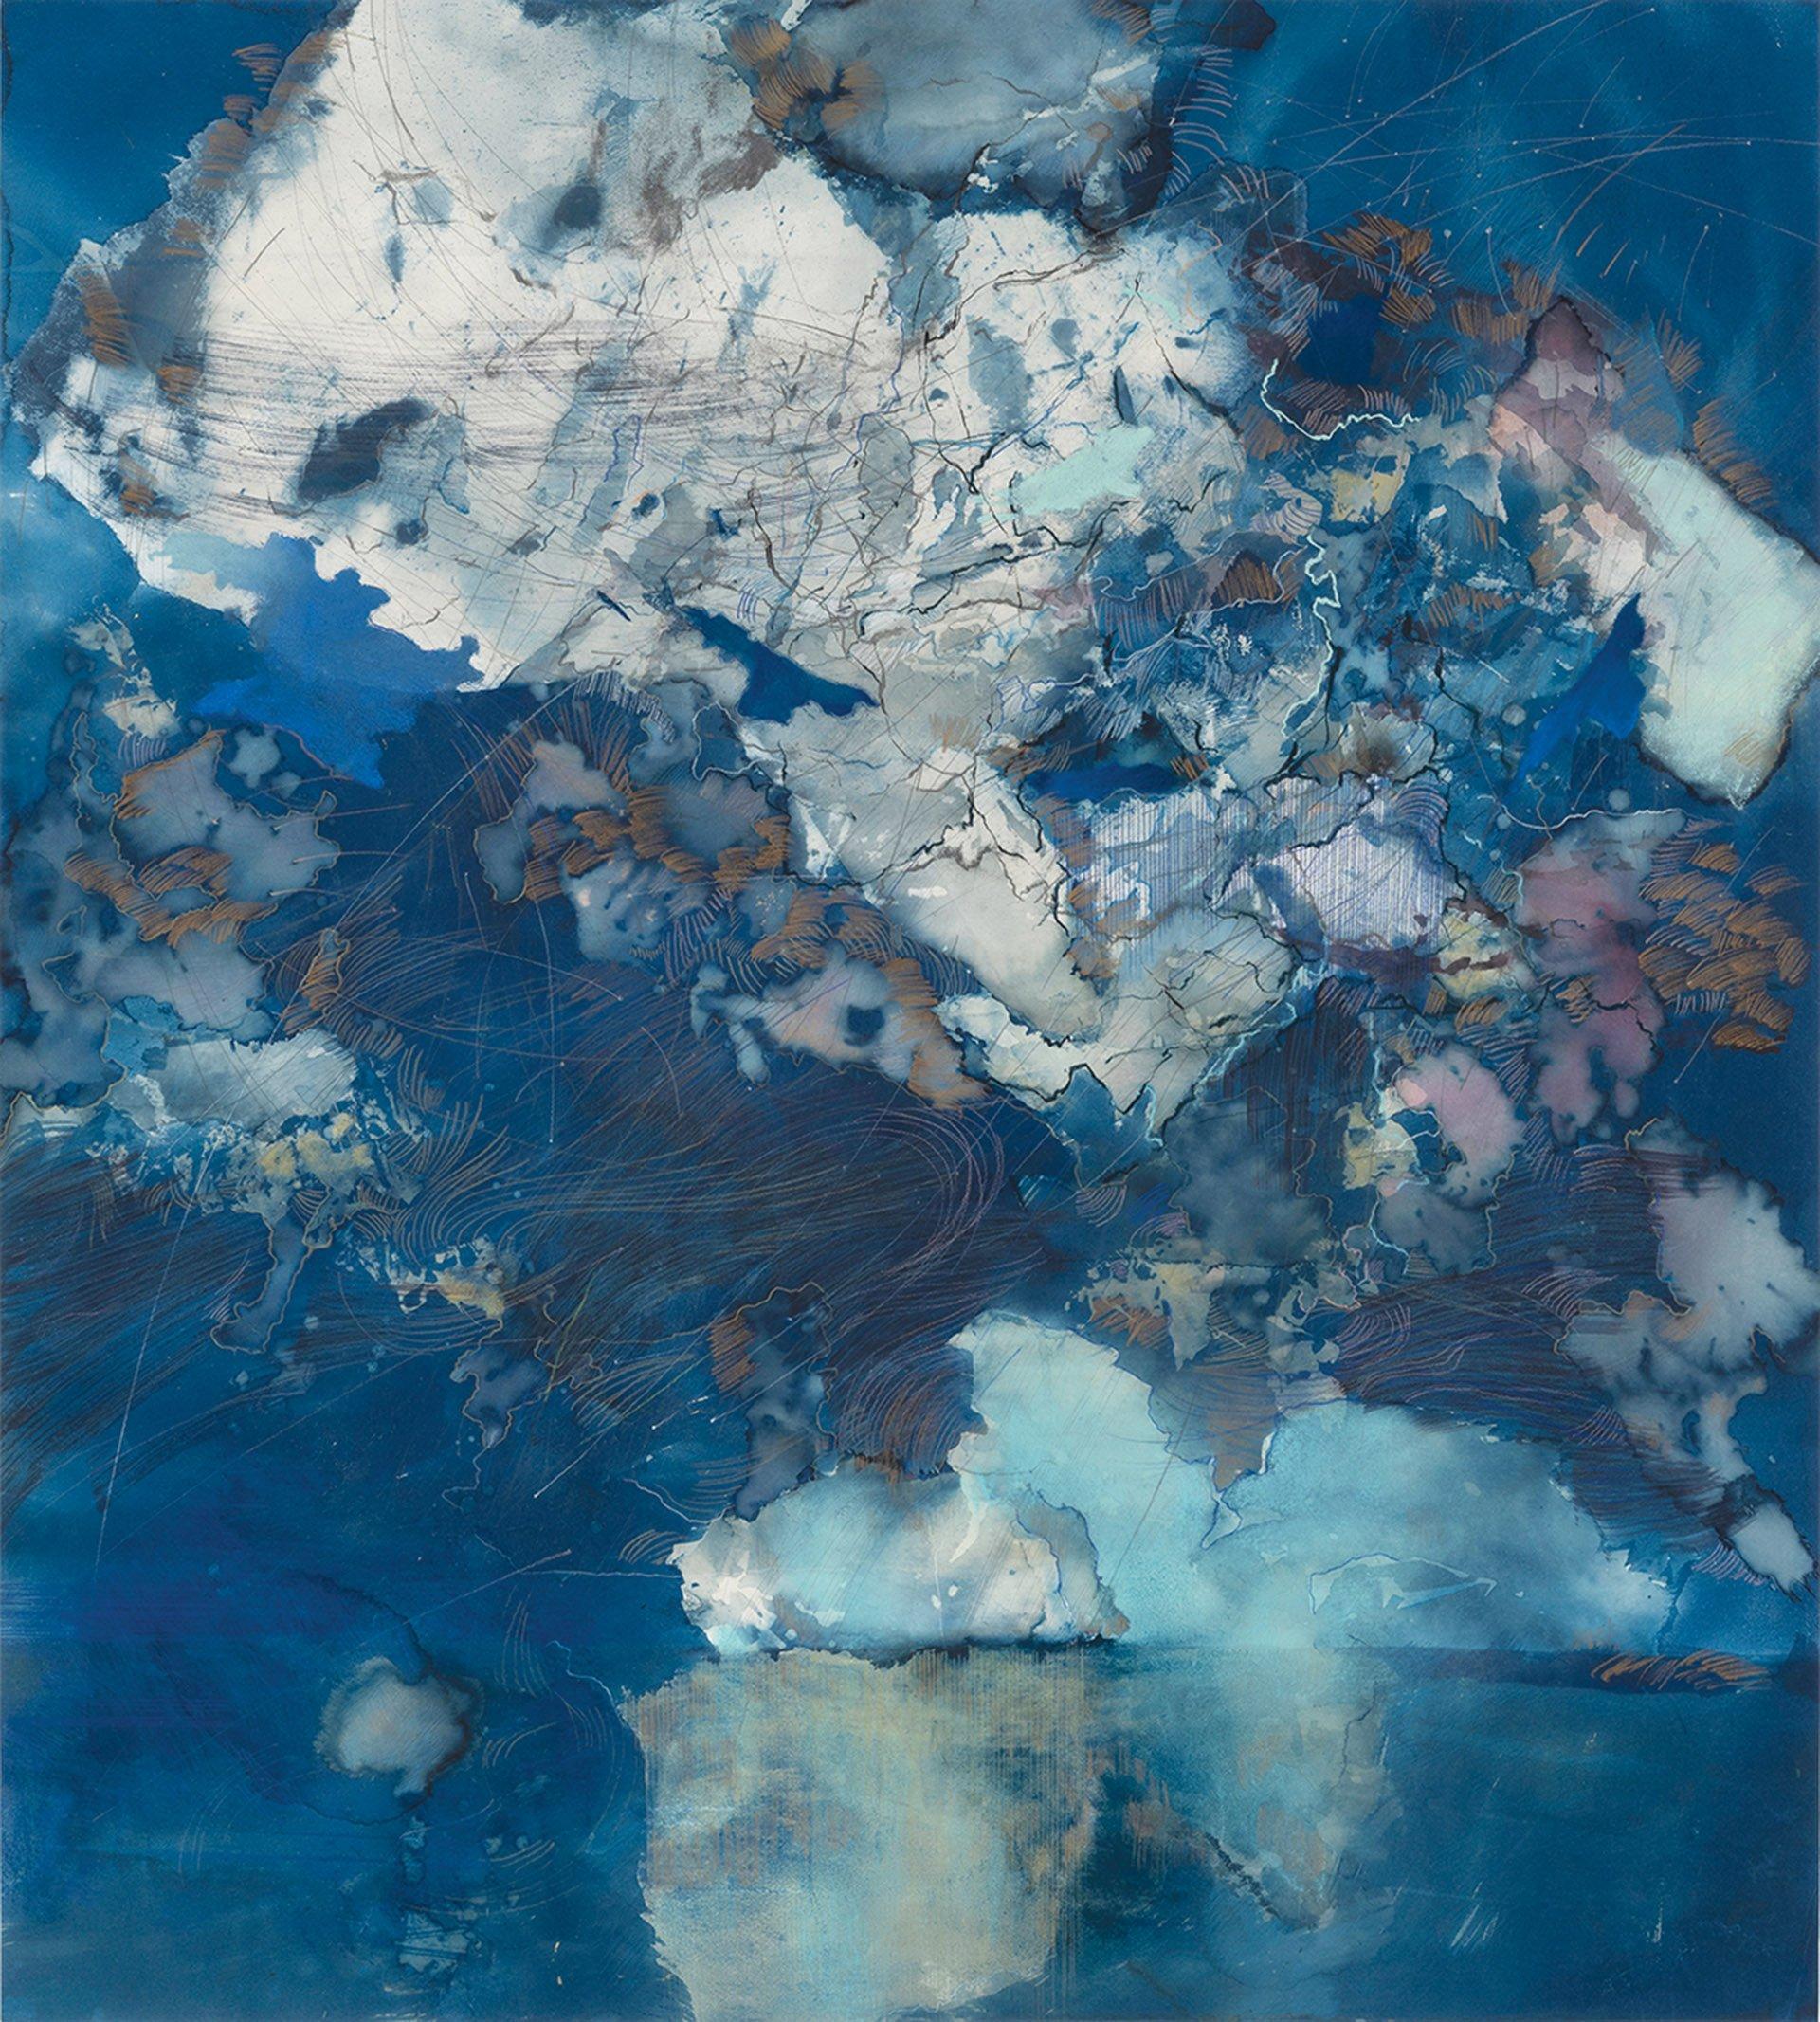 Ocean Narratives by Jowita Wyszomirska